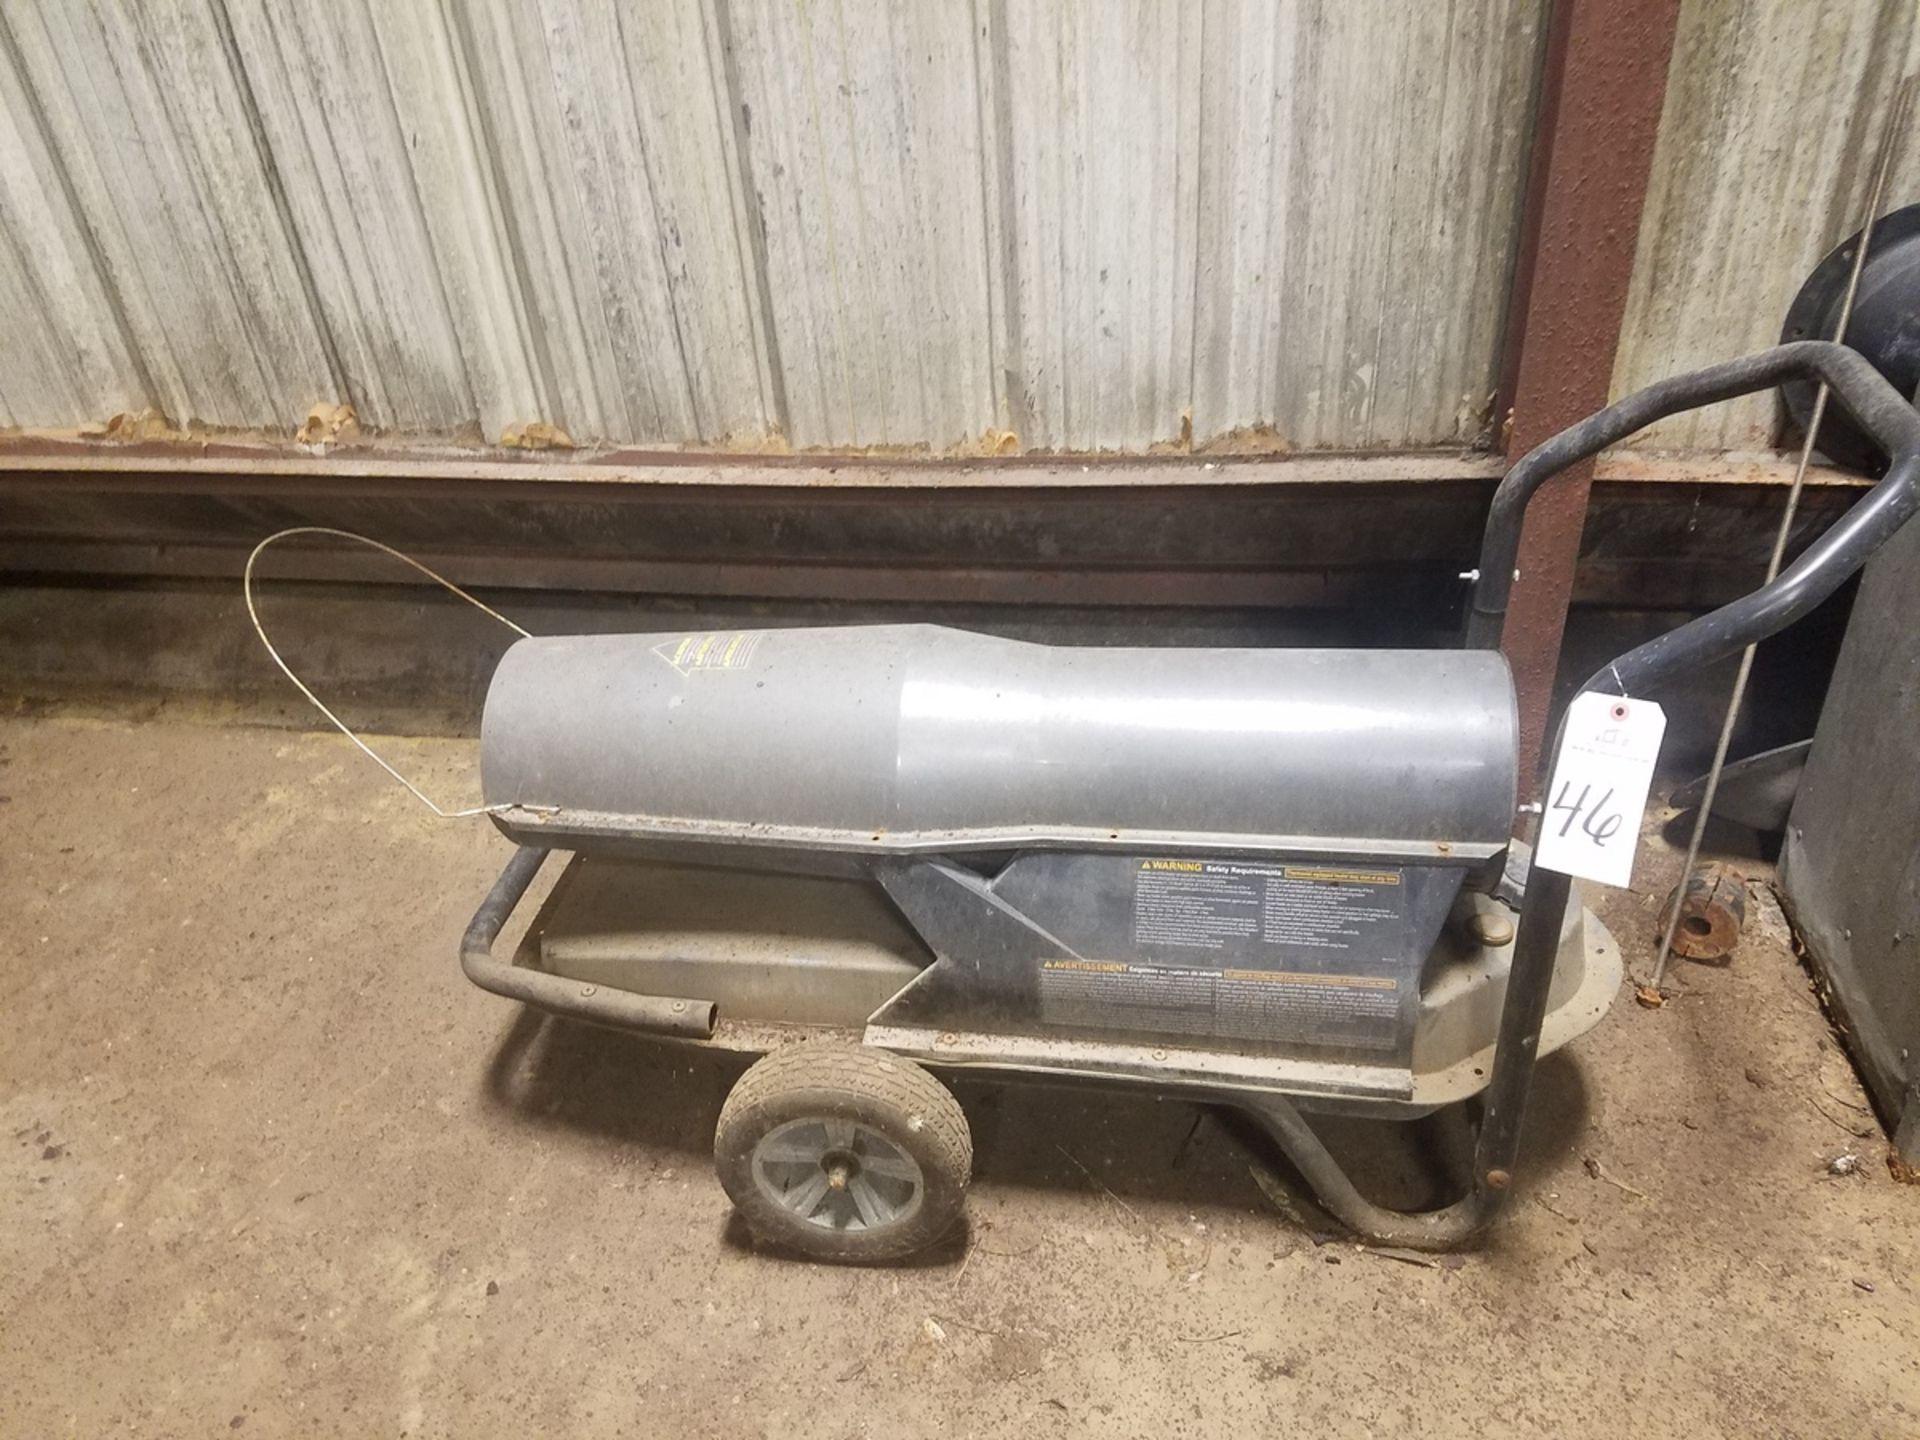 Procom Magnum Oil Fired Heater | Rig Fee: $25